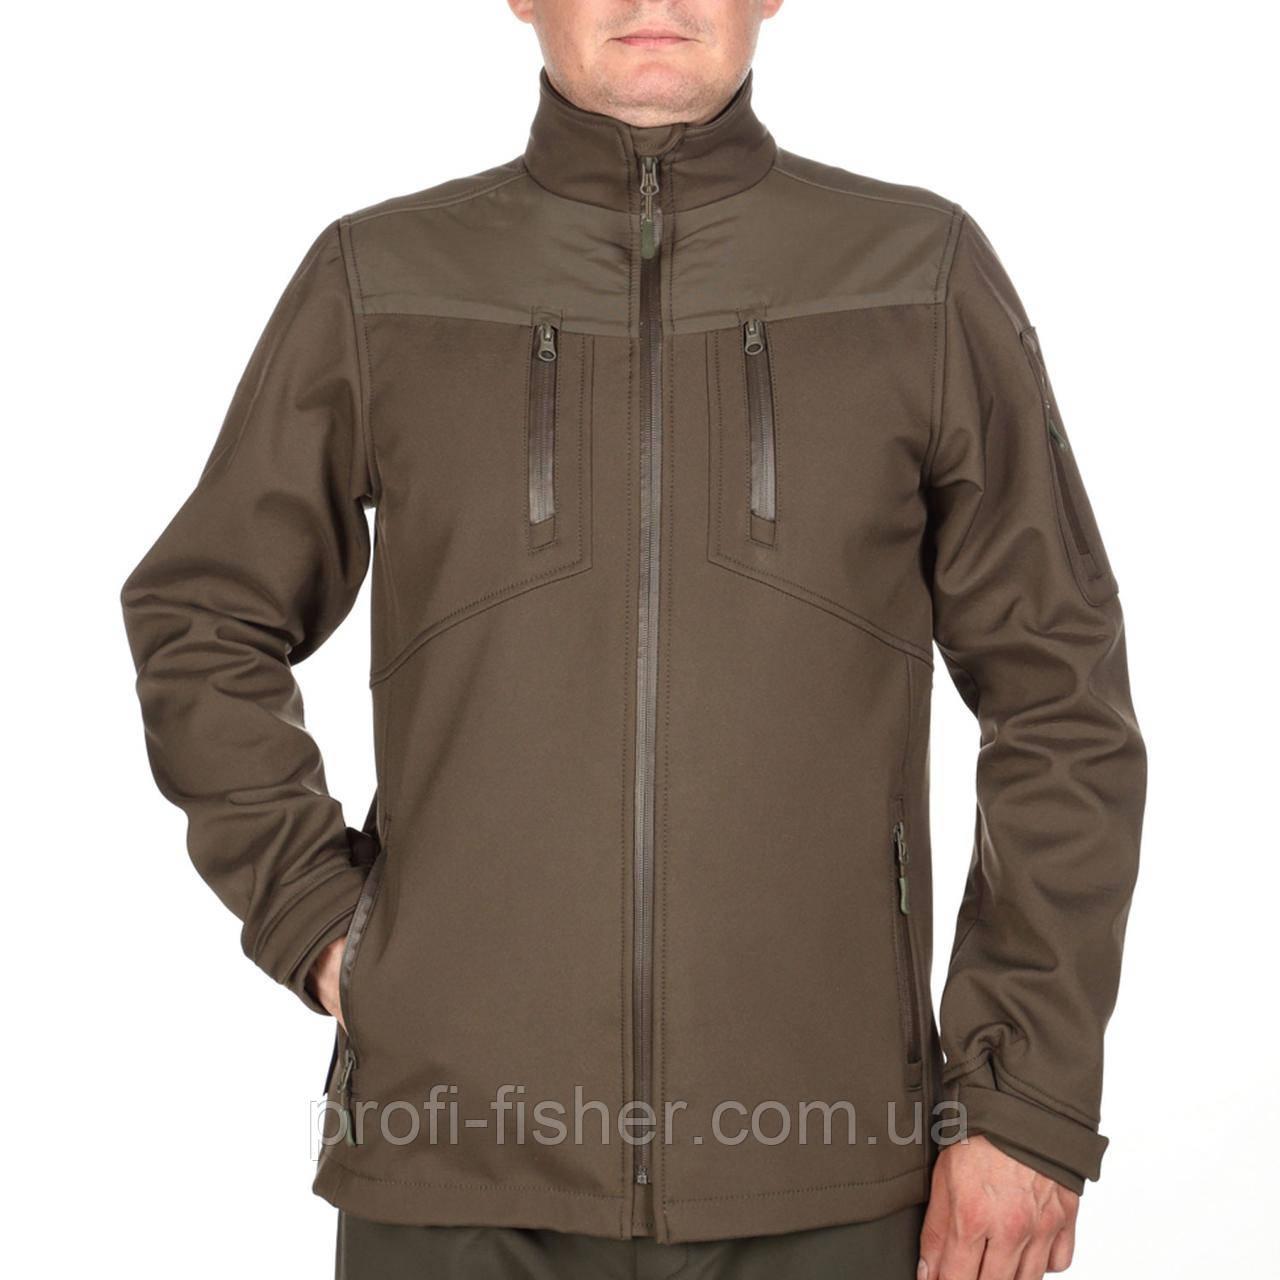 Куртка KLOST Soft Shell Sporttactic 5019 5XL Asphalt